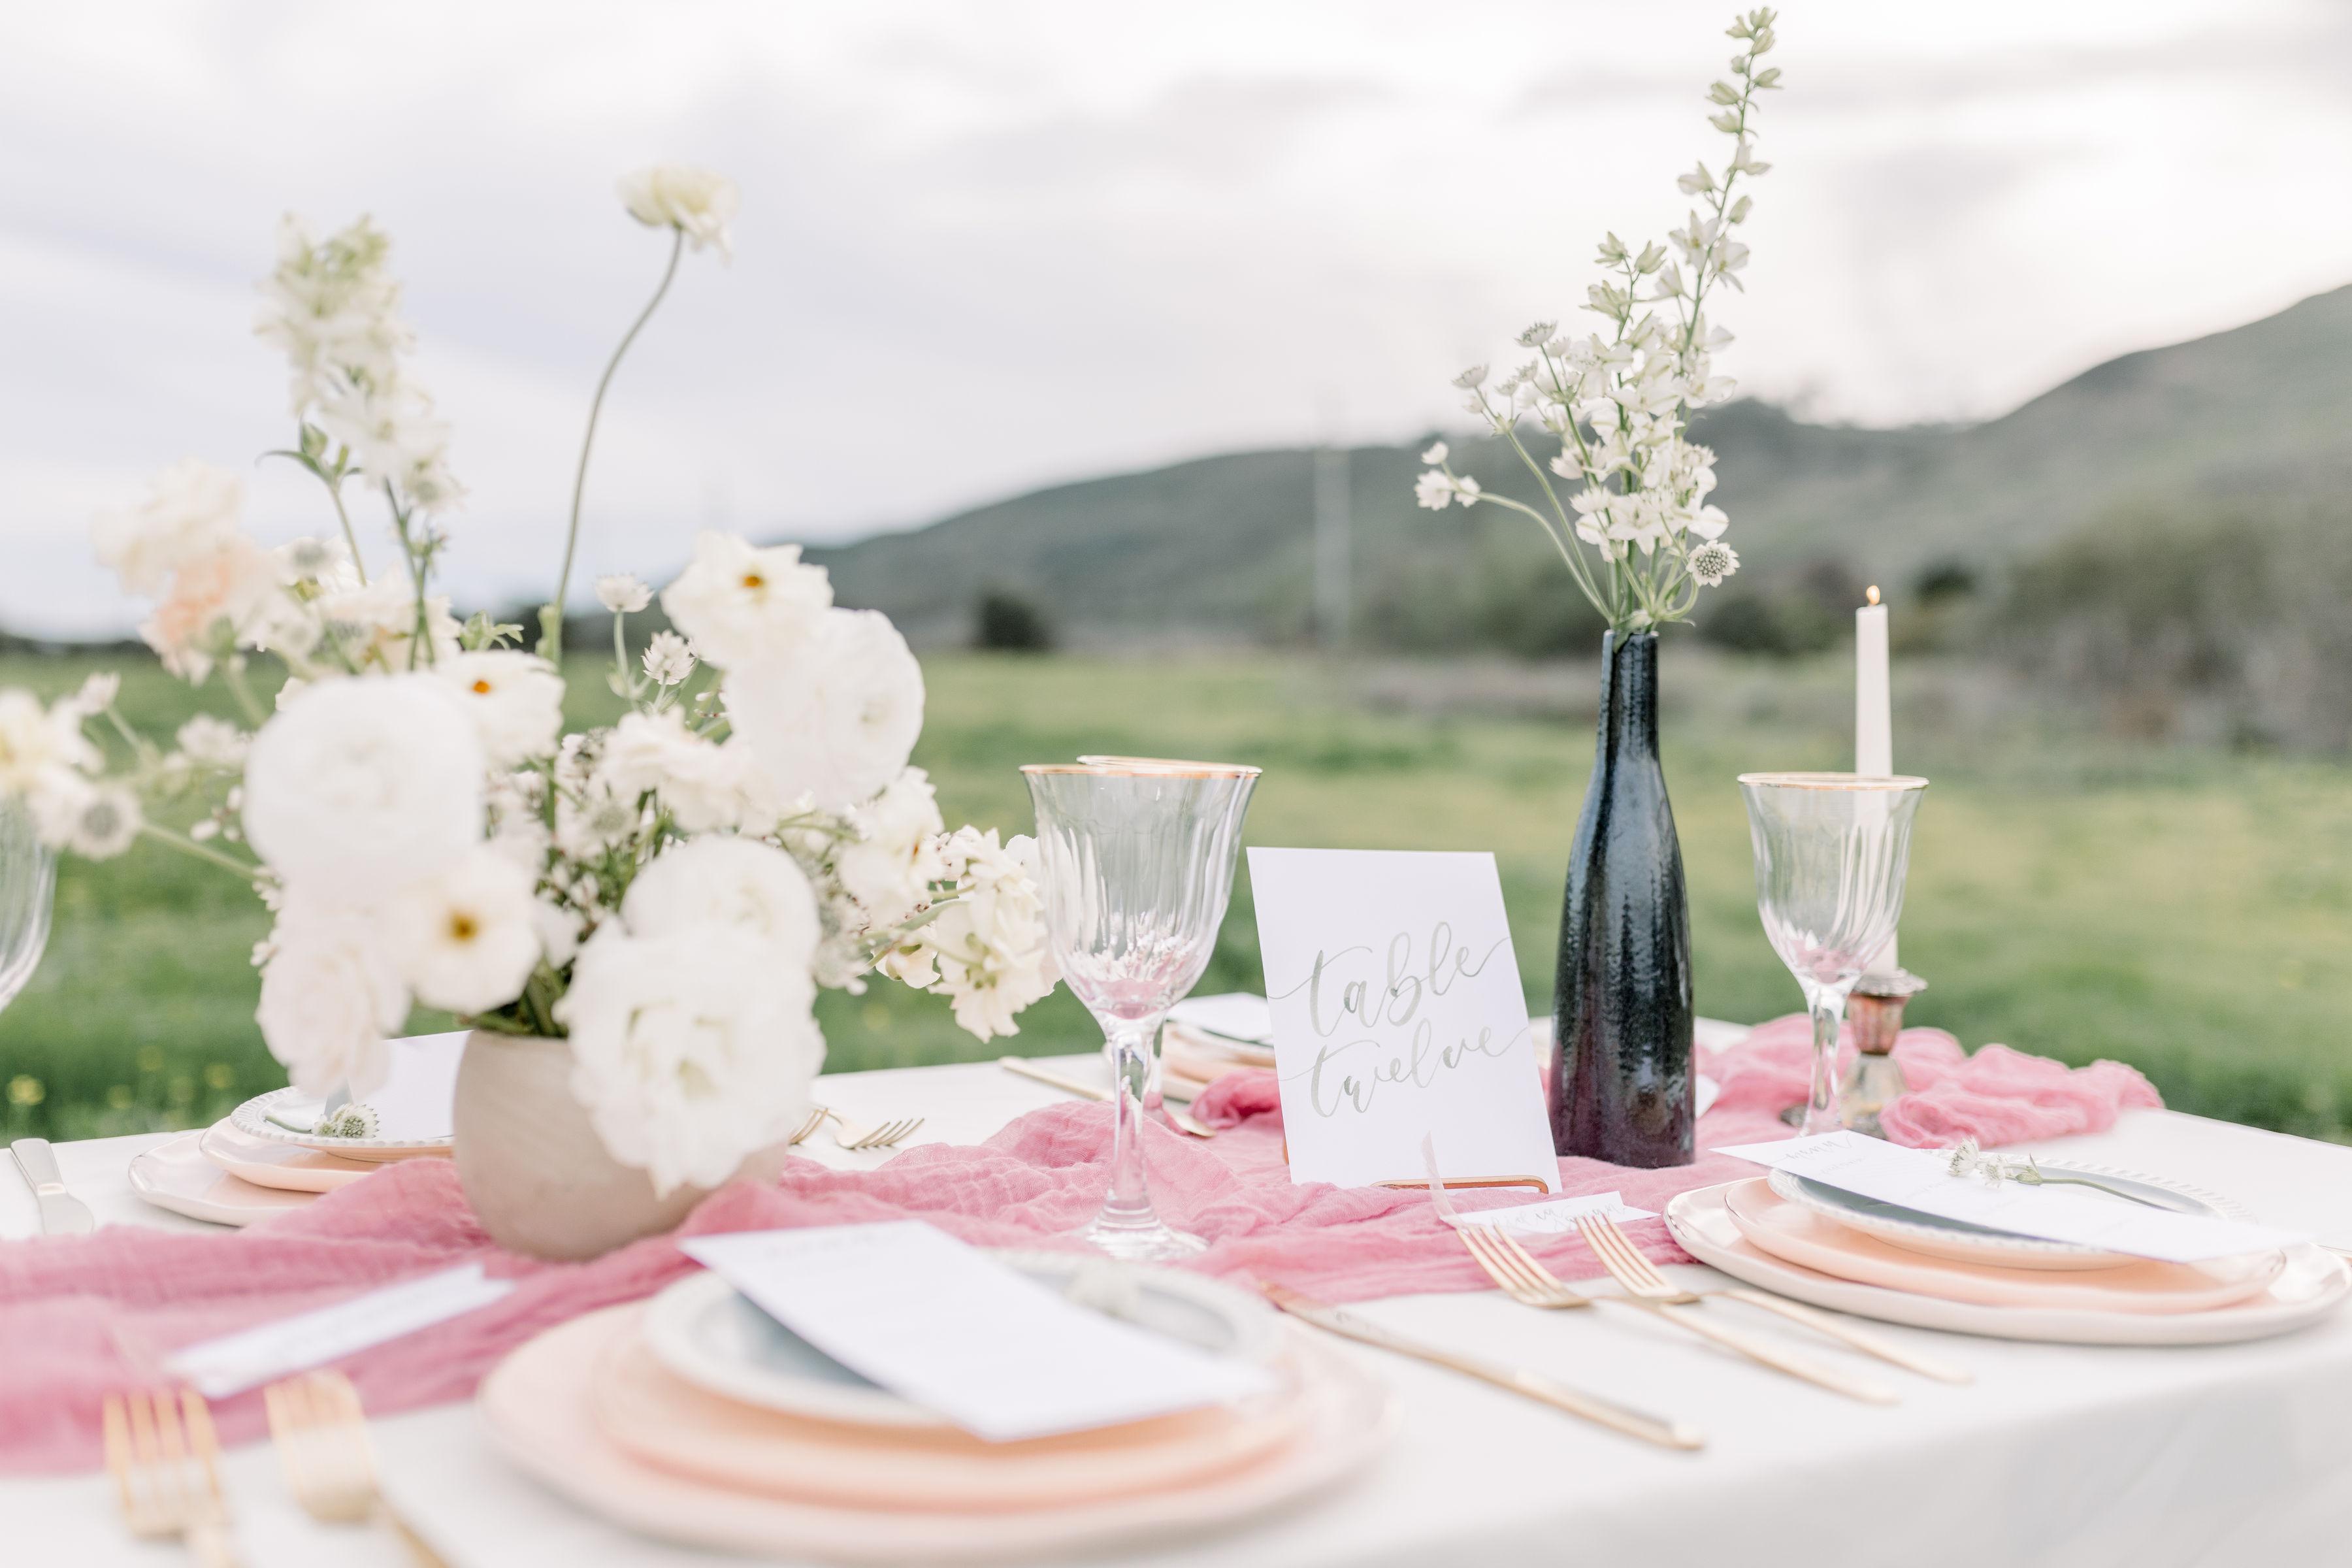 StephanieWeberPhotography-Green Wedding Reception Tablescape, Sam Allen Creates